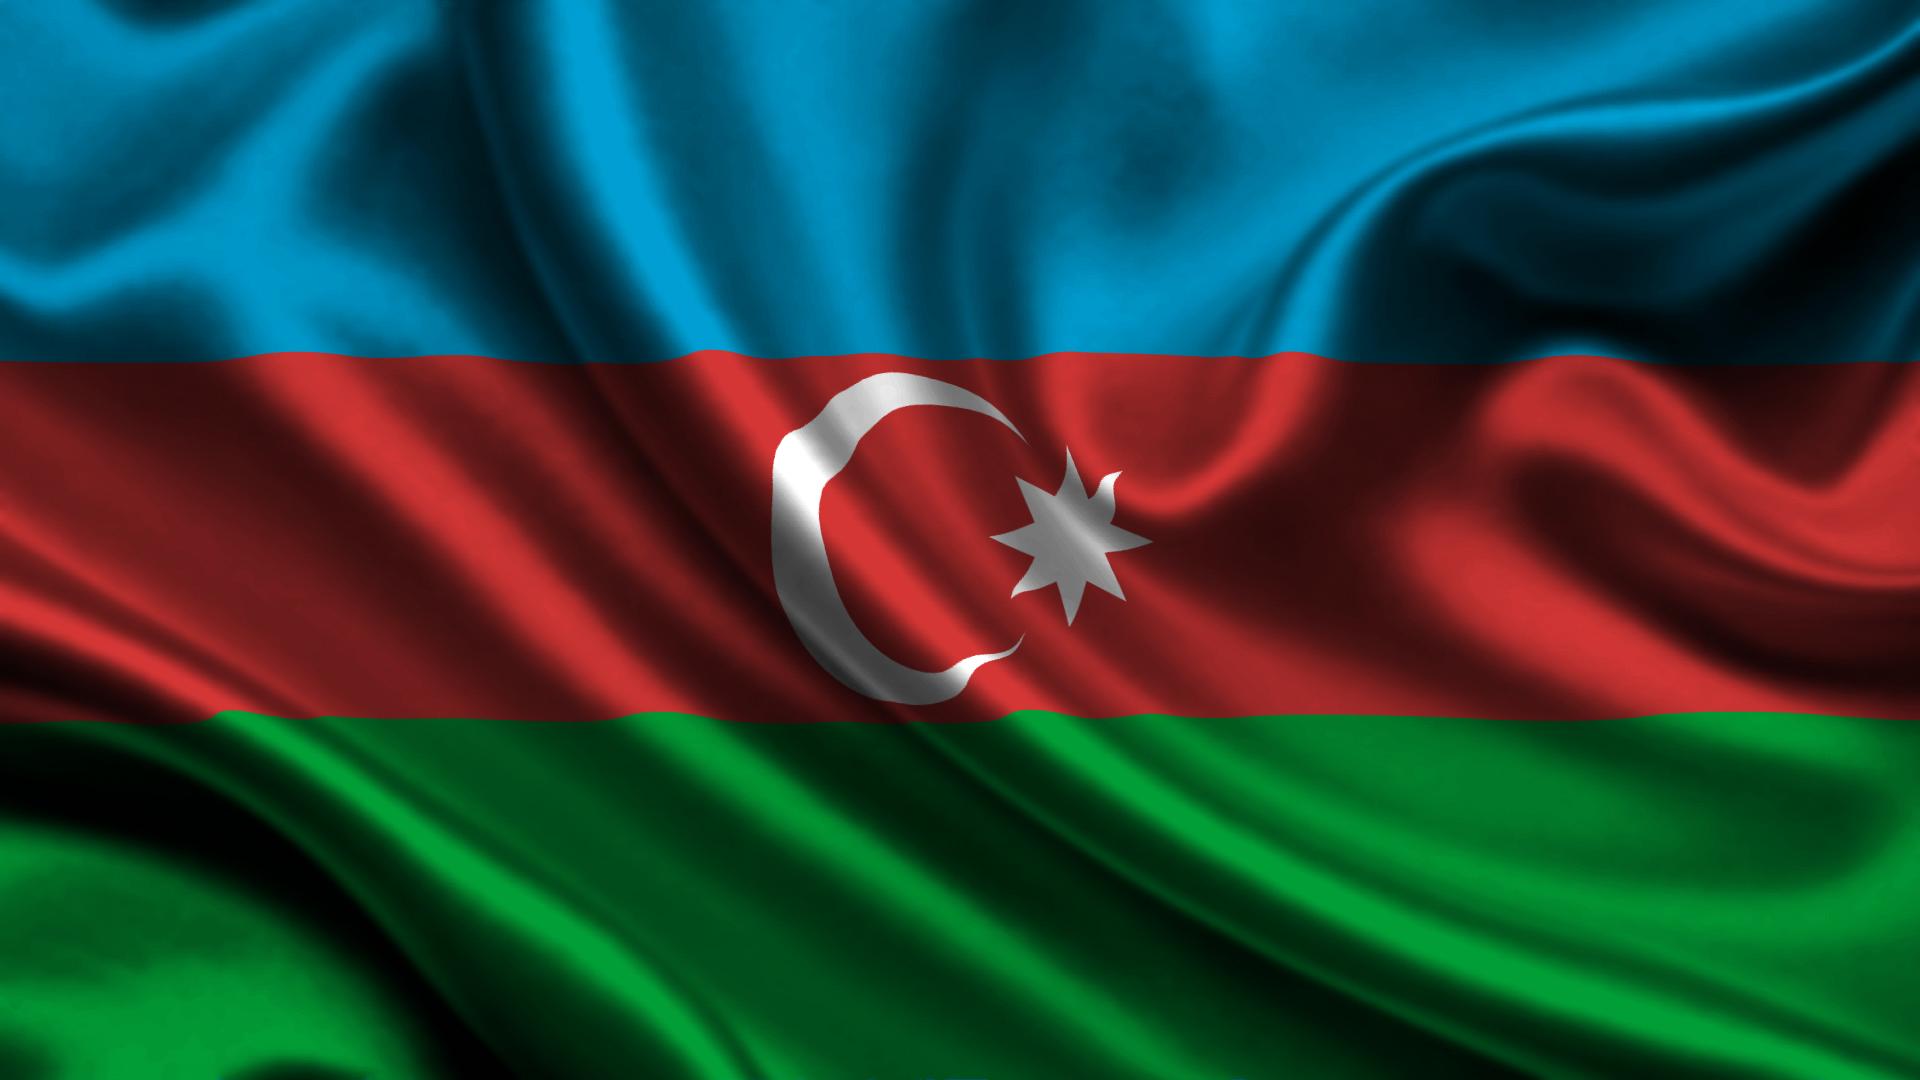 Nice wallpapers Flag Of Azerbaijan 1920x1080px